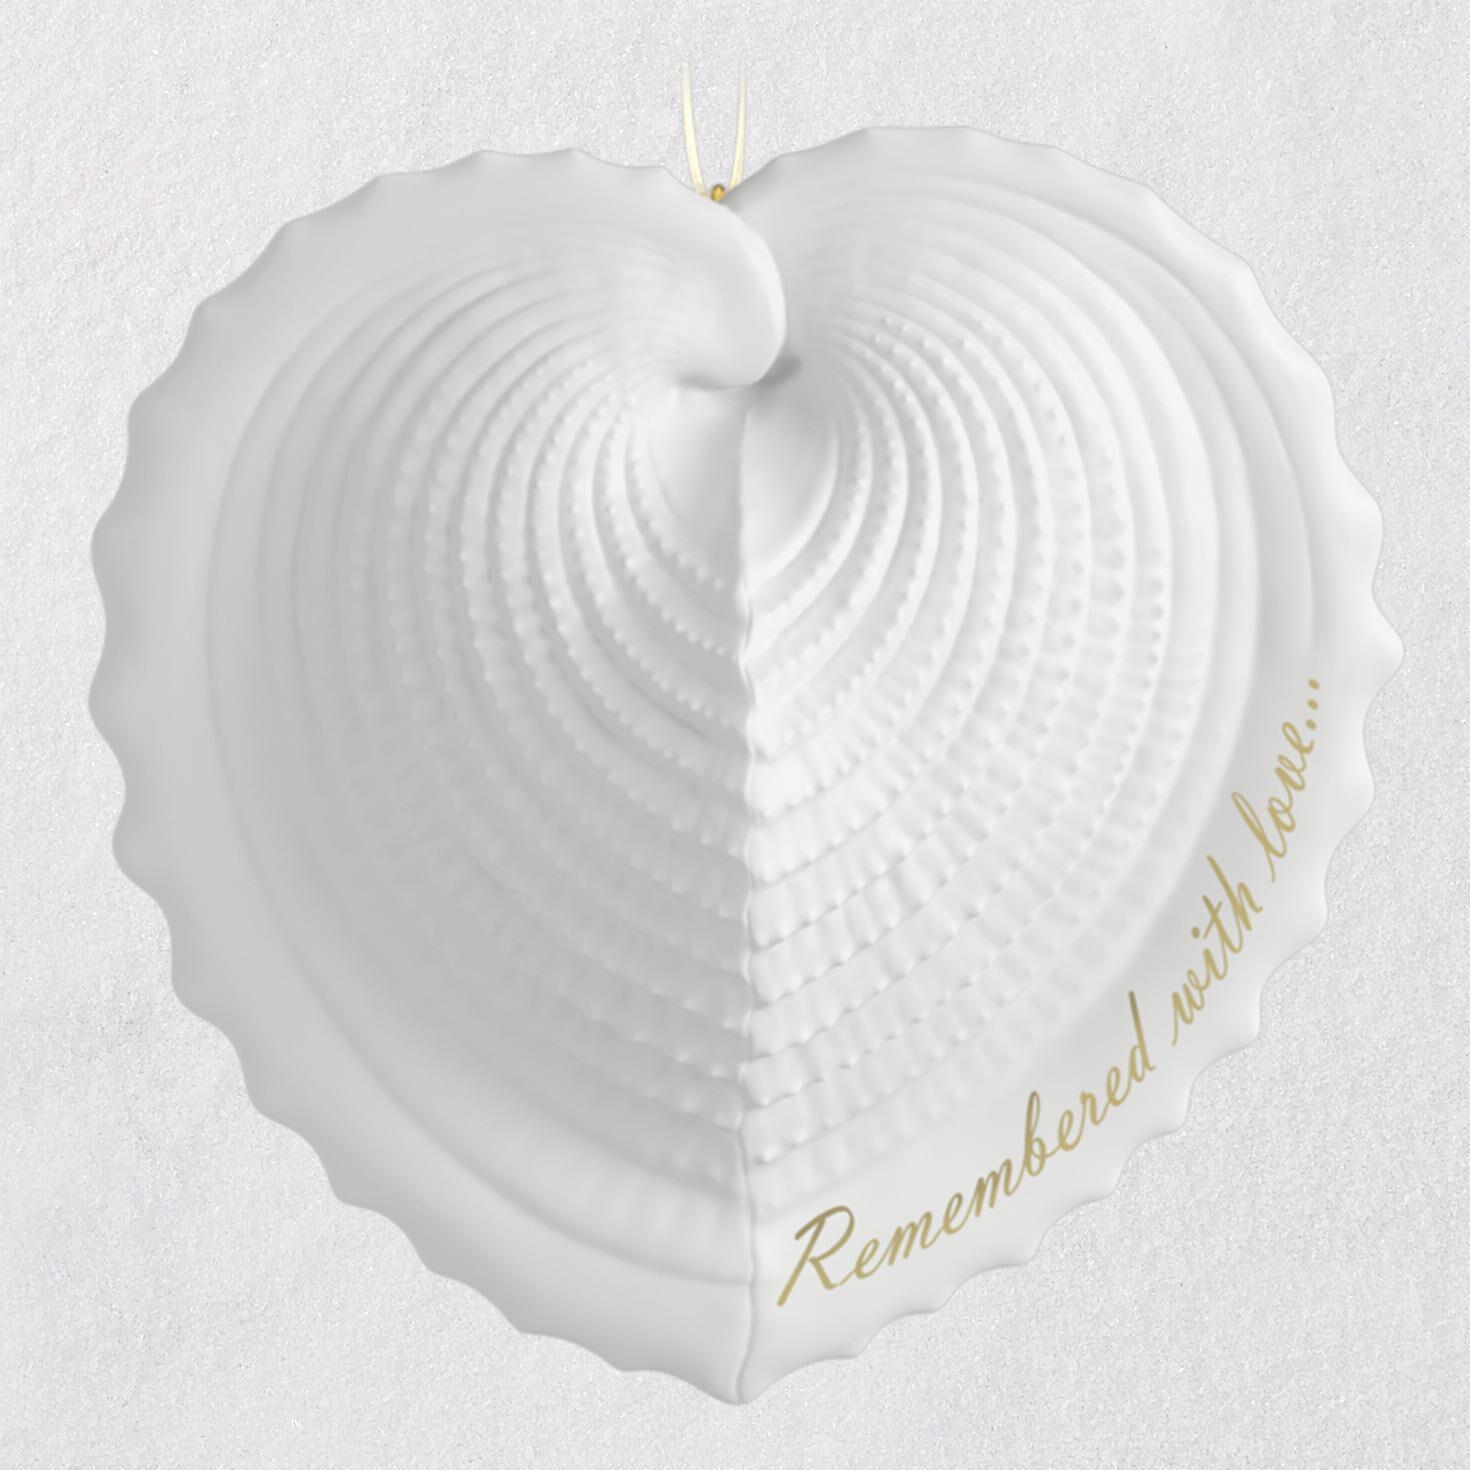 Remembered With Love Memorial 2018 Porcelain Ornament - Keepsake ...